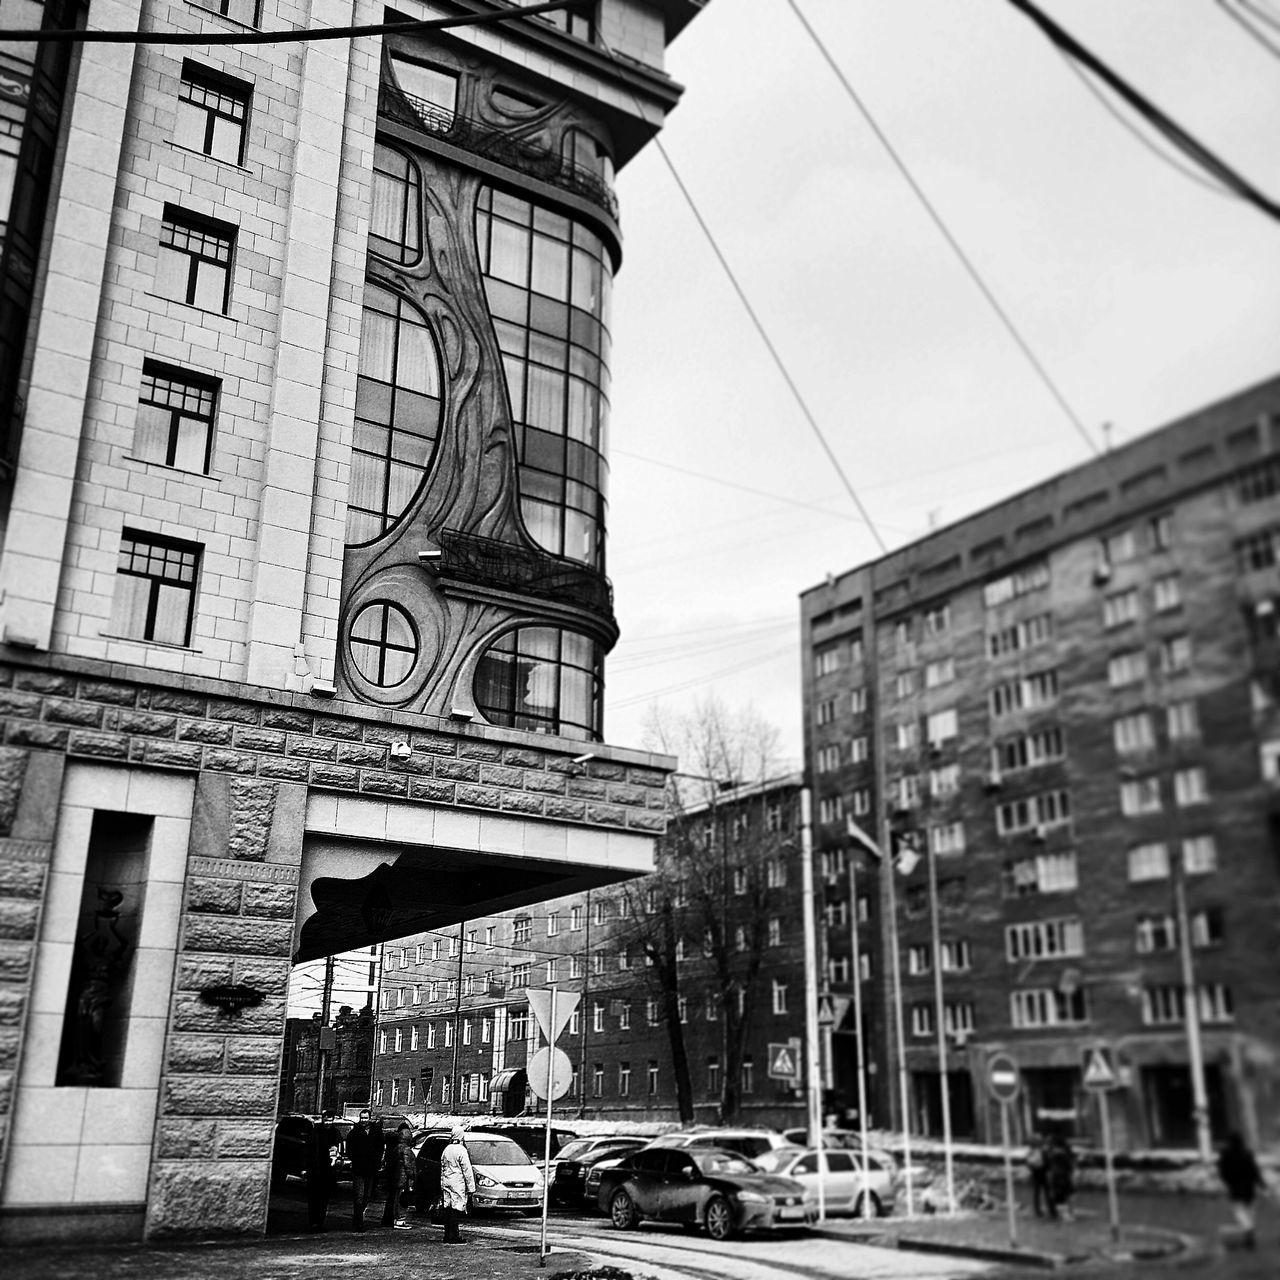 Architecture Monochrome Blackandwhite Tadaa Community AMPt Community Streetphoto_bw Black & White